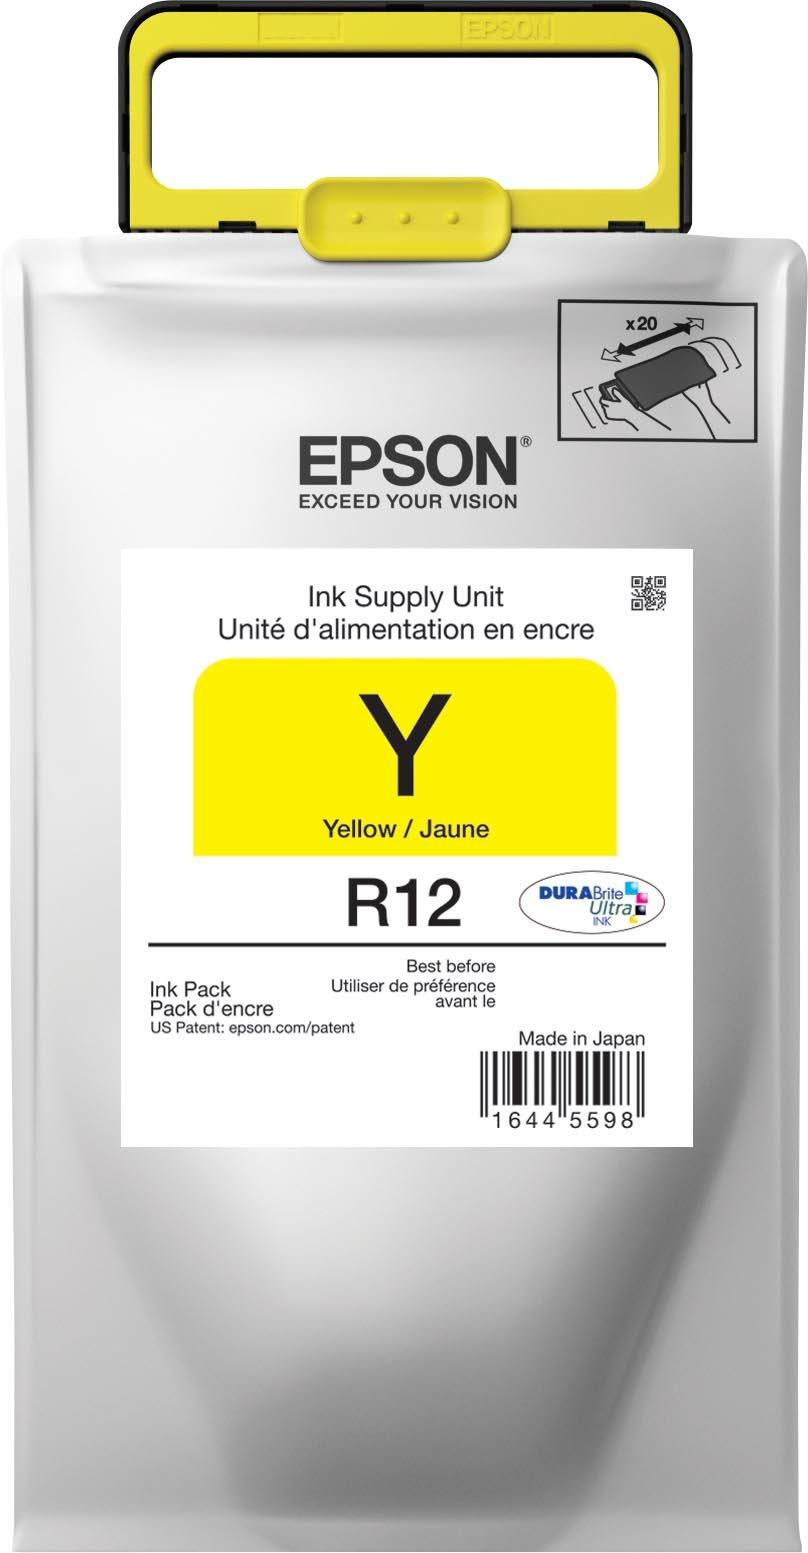 Epson DURABrite Ultra Standard Capacity, Yellow Ink (TR12420) by Epson